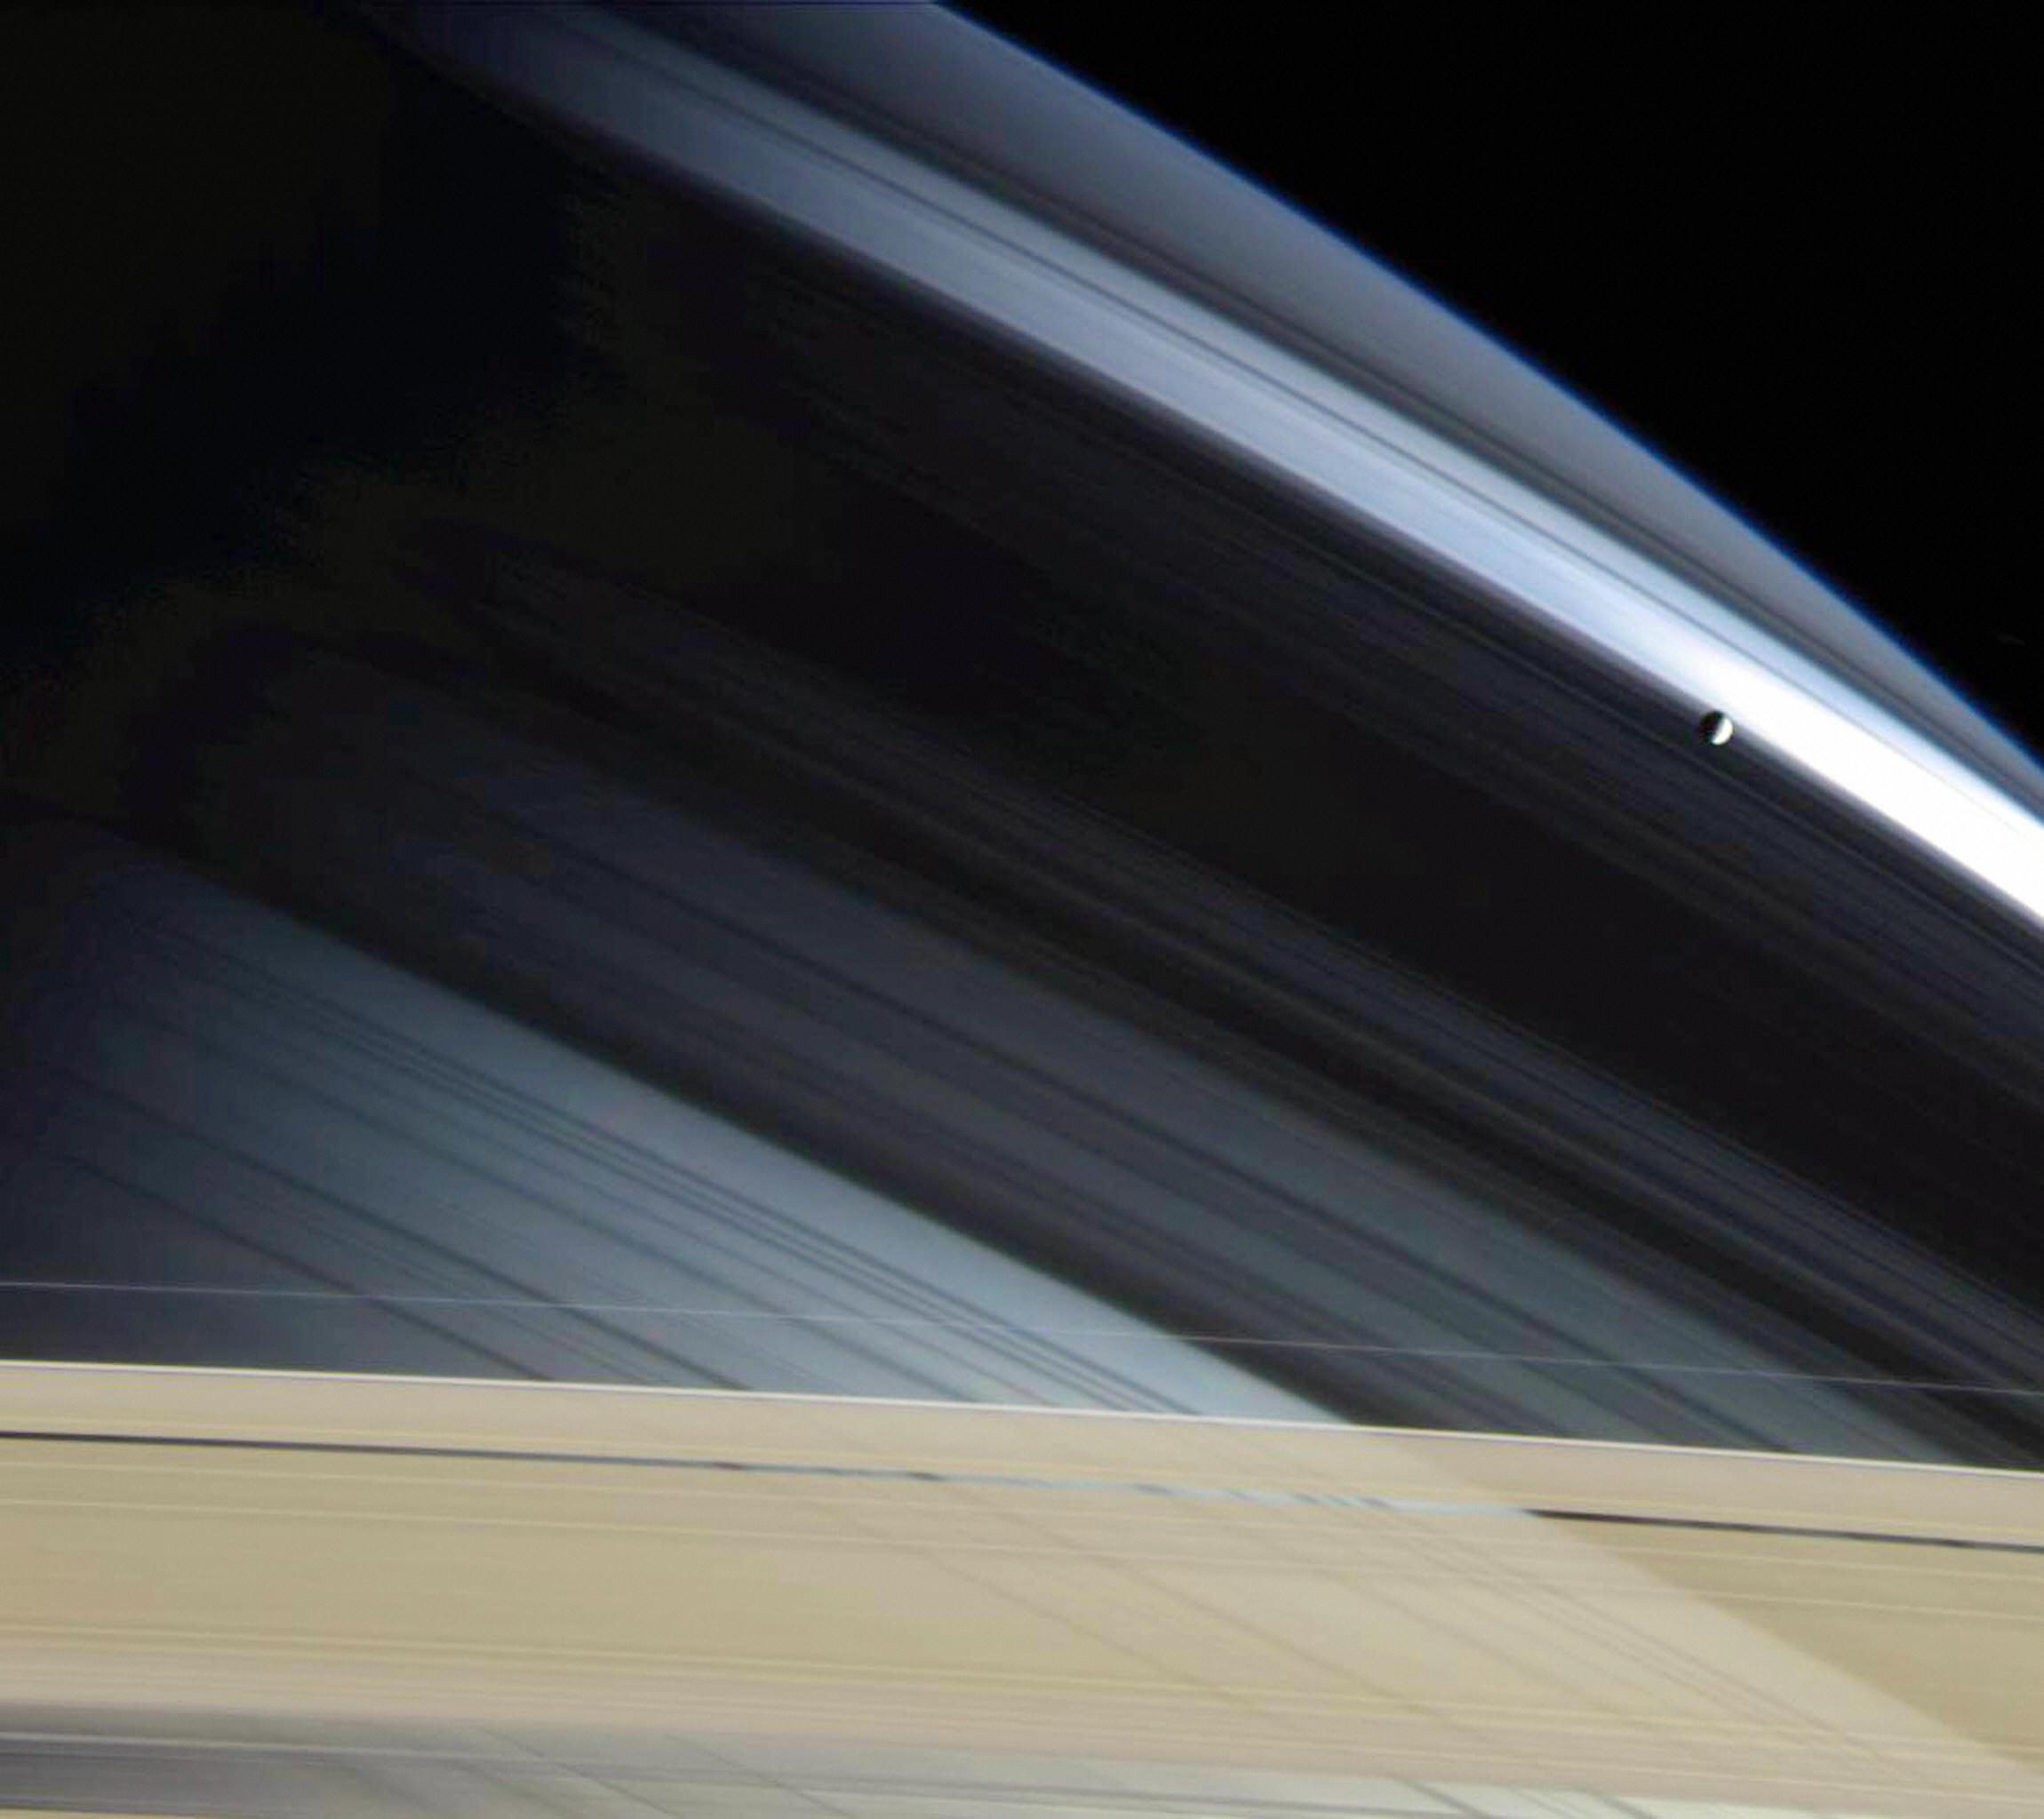 Saturn's lonely moon, Mimas on Nov. 30, 2004.